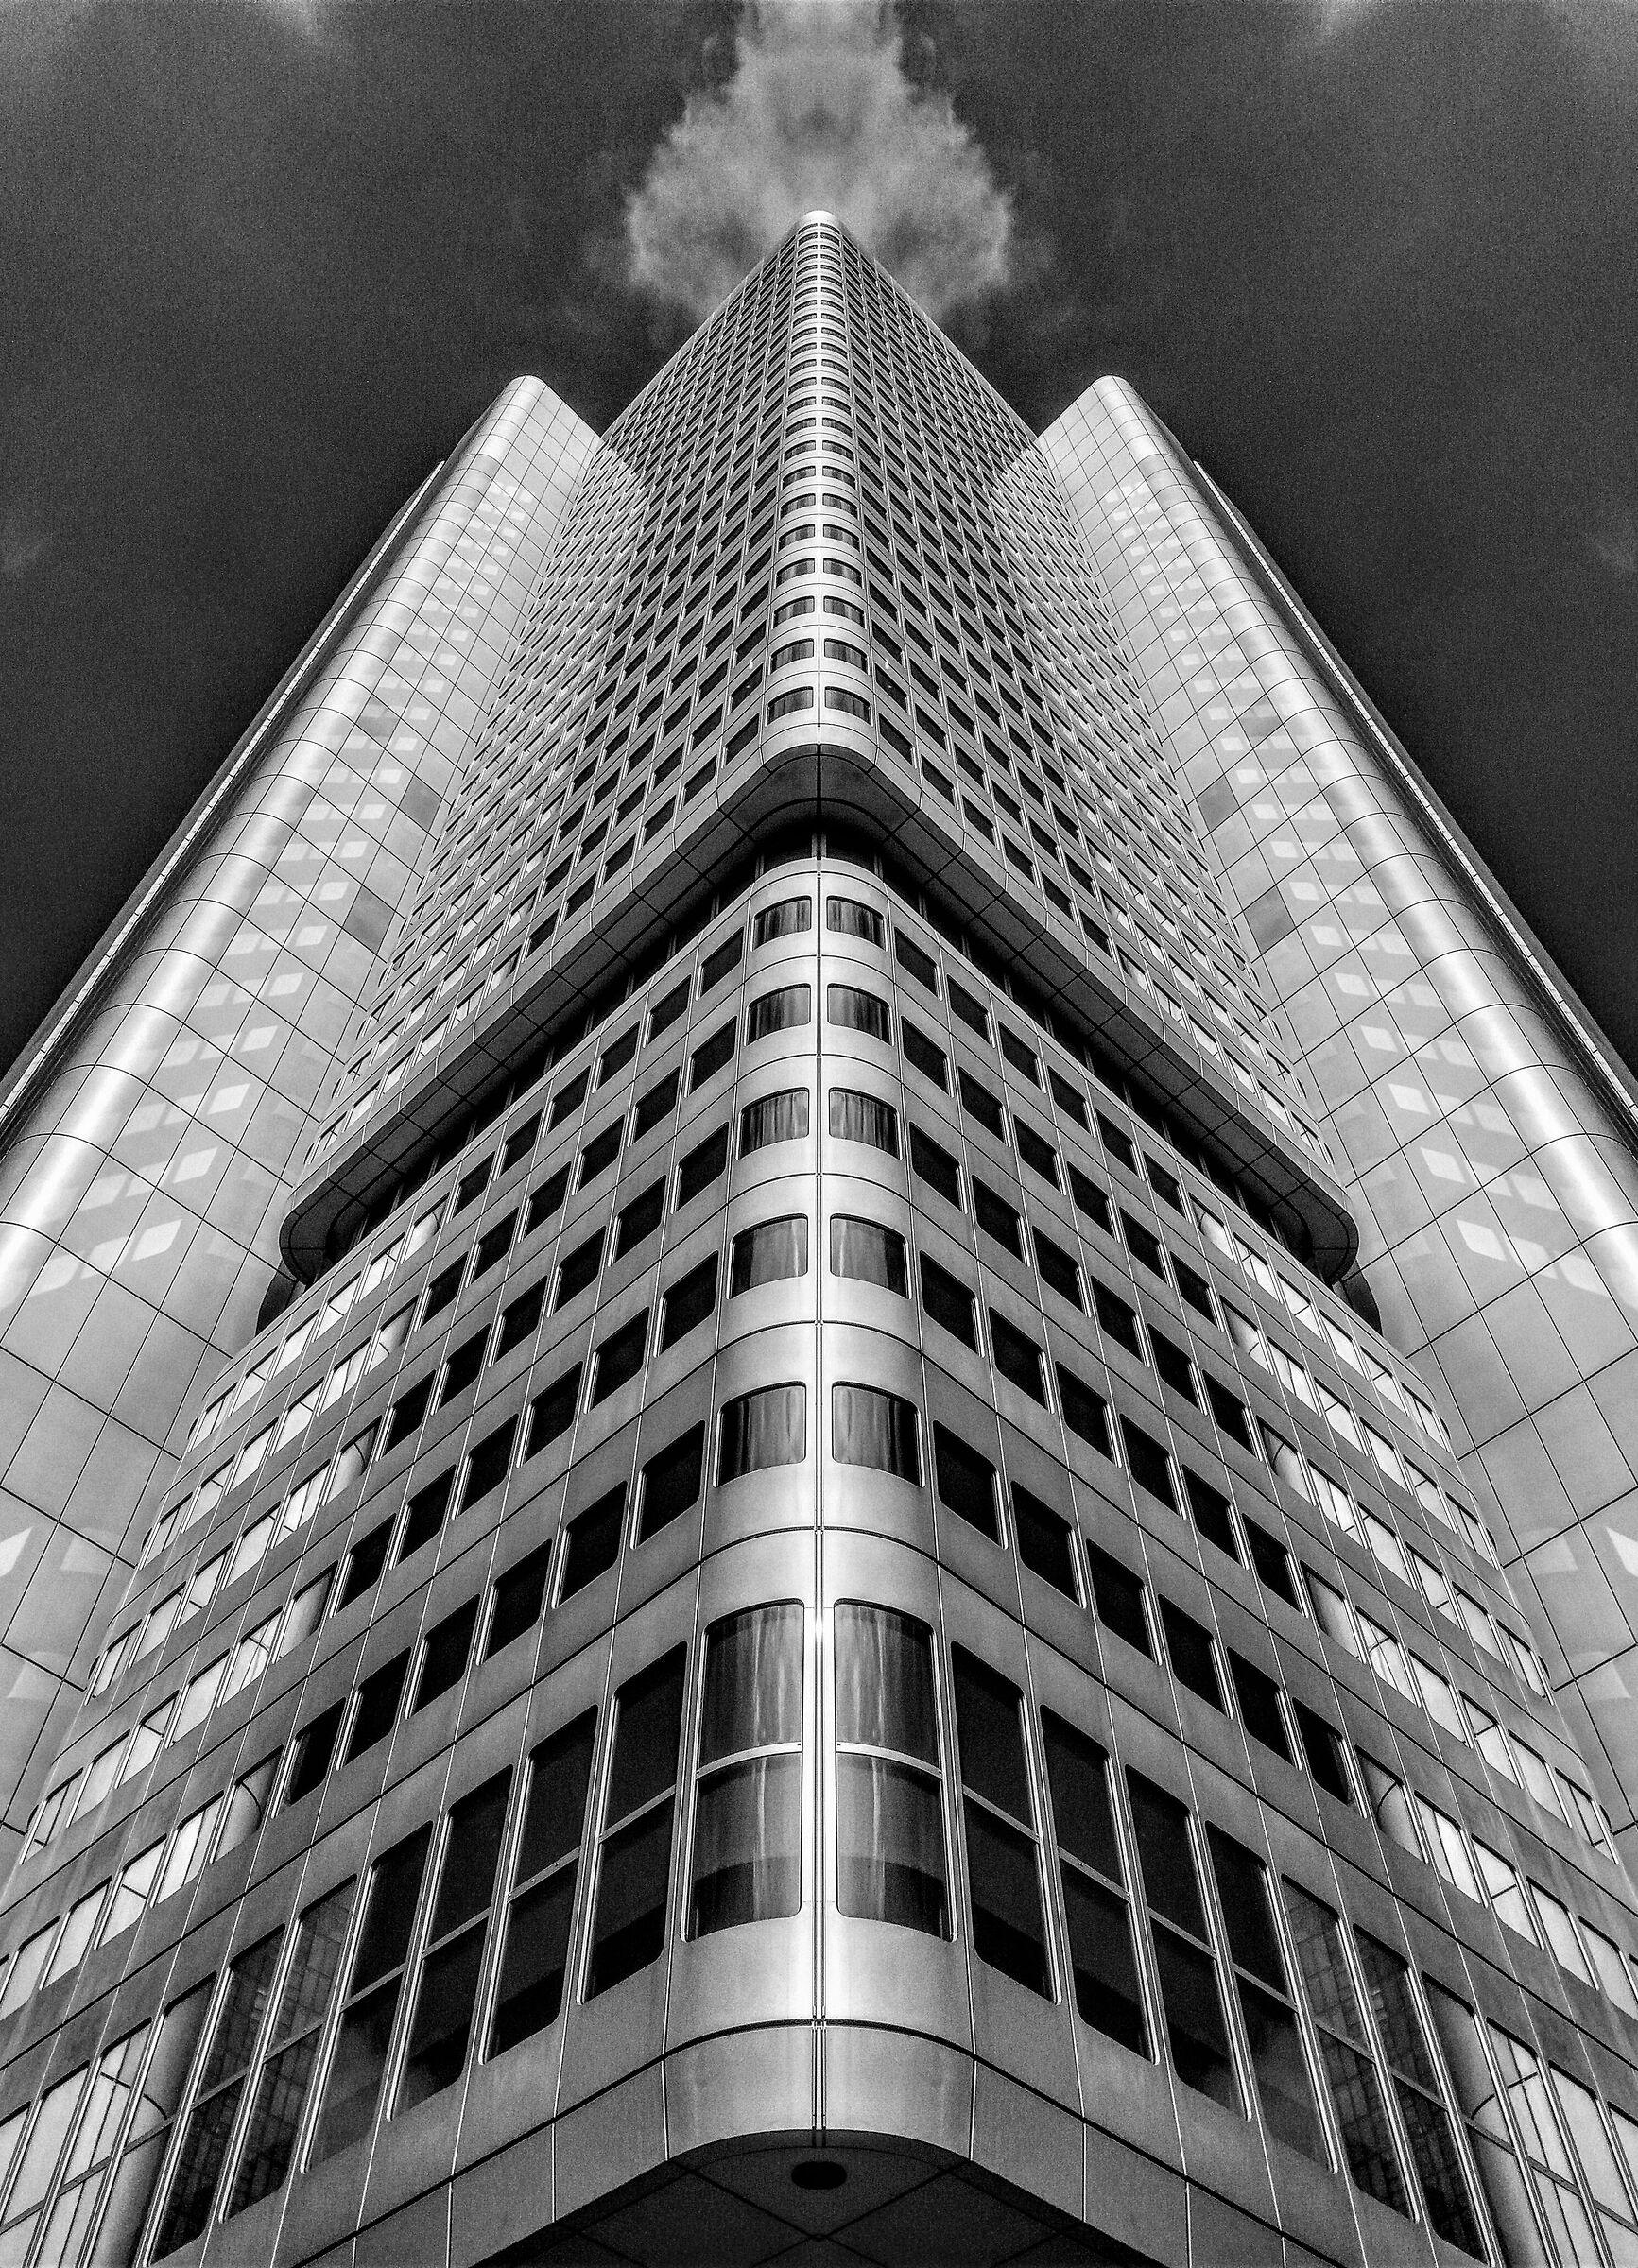 Frankfurt skyscraper in the mirror...